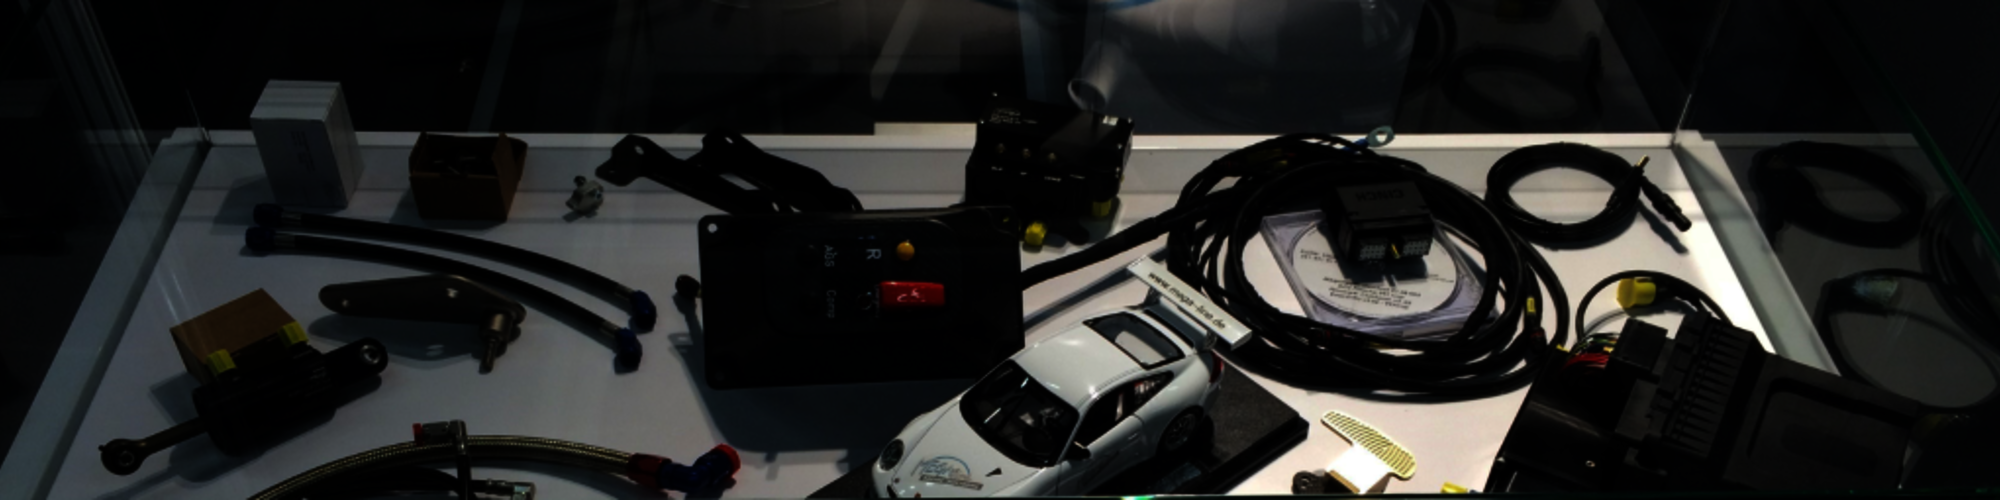 MEGA-Line RACING ELECTRONIC   Motorsportjobs.com